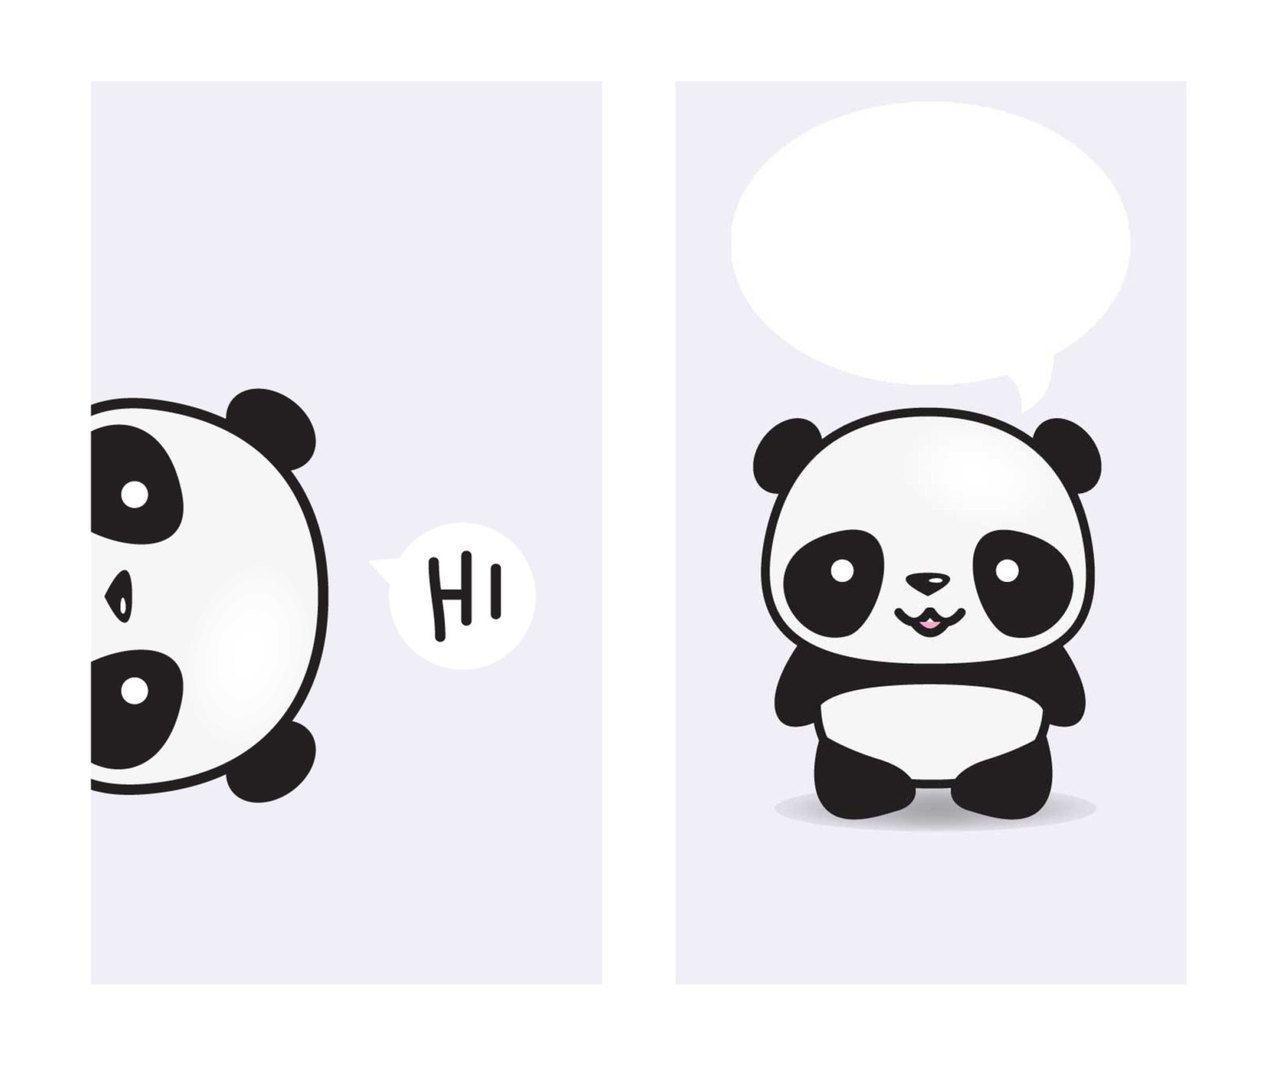 Kawaii Panda Girl Wallpapers Top Free Kawaii Panda Girl